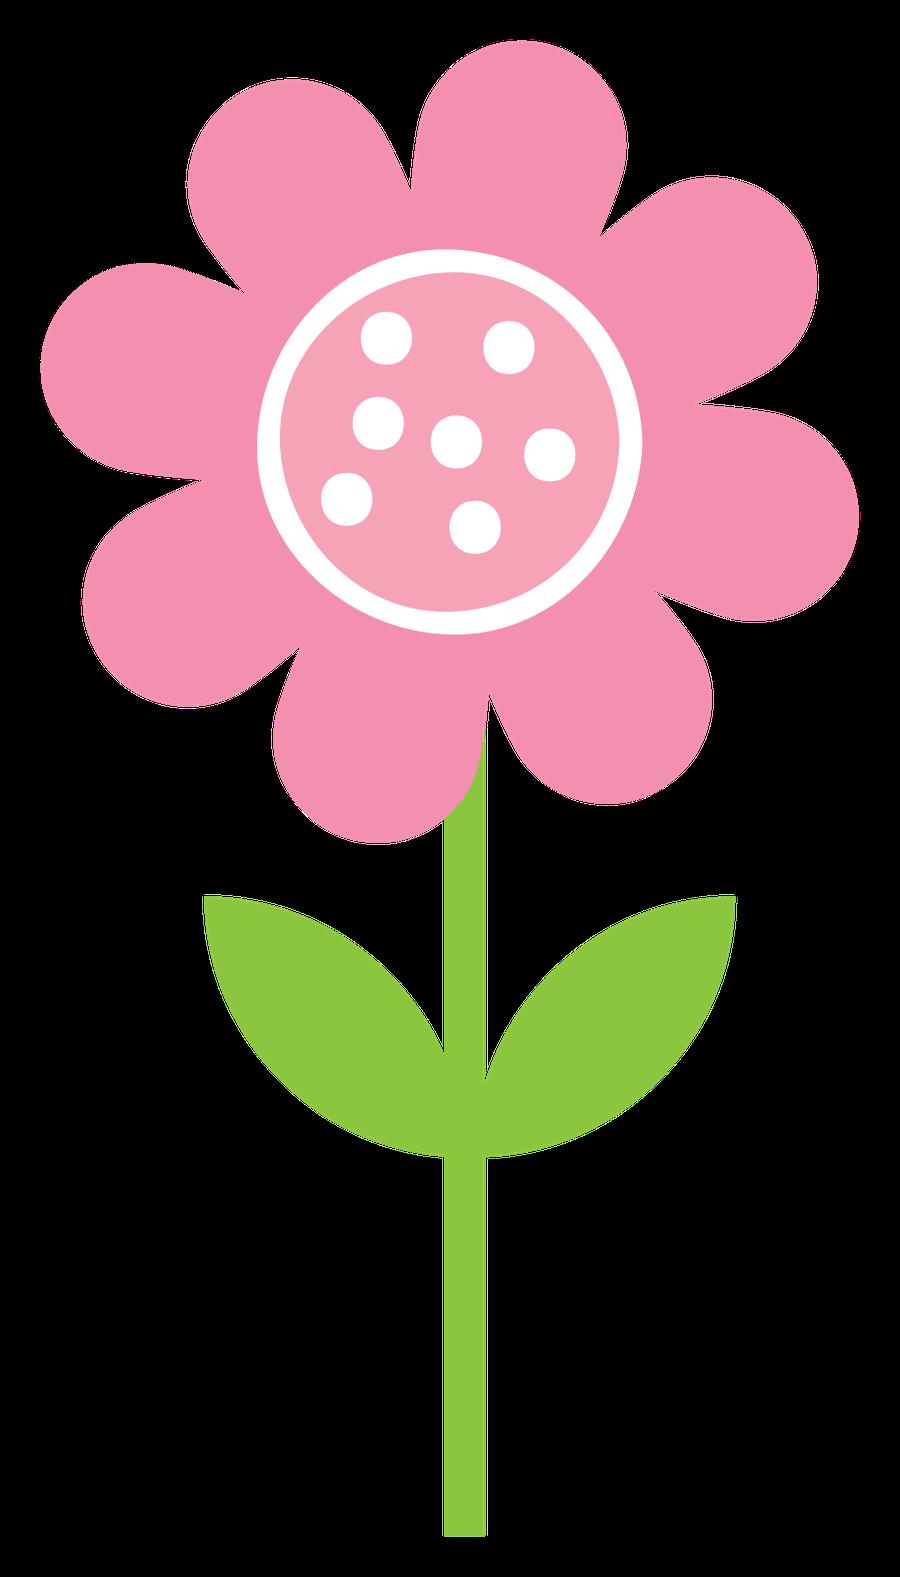 Flower girl basket clipart. Http daniellemoraesfalcao minus com